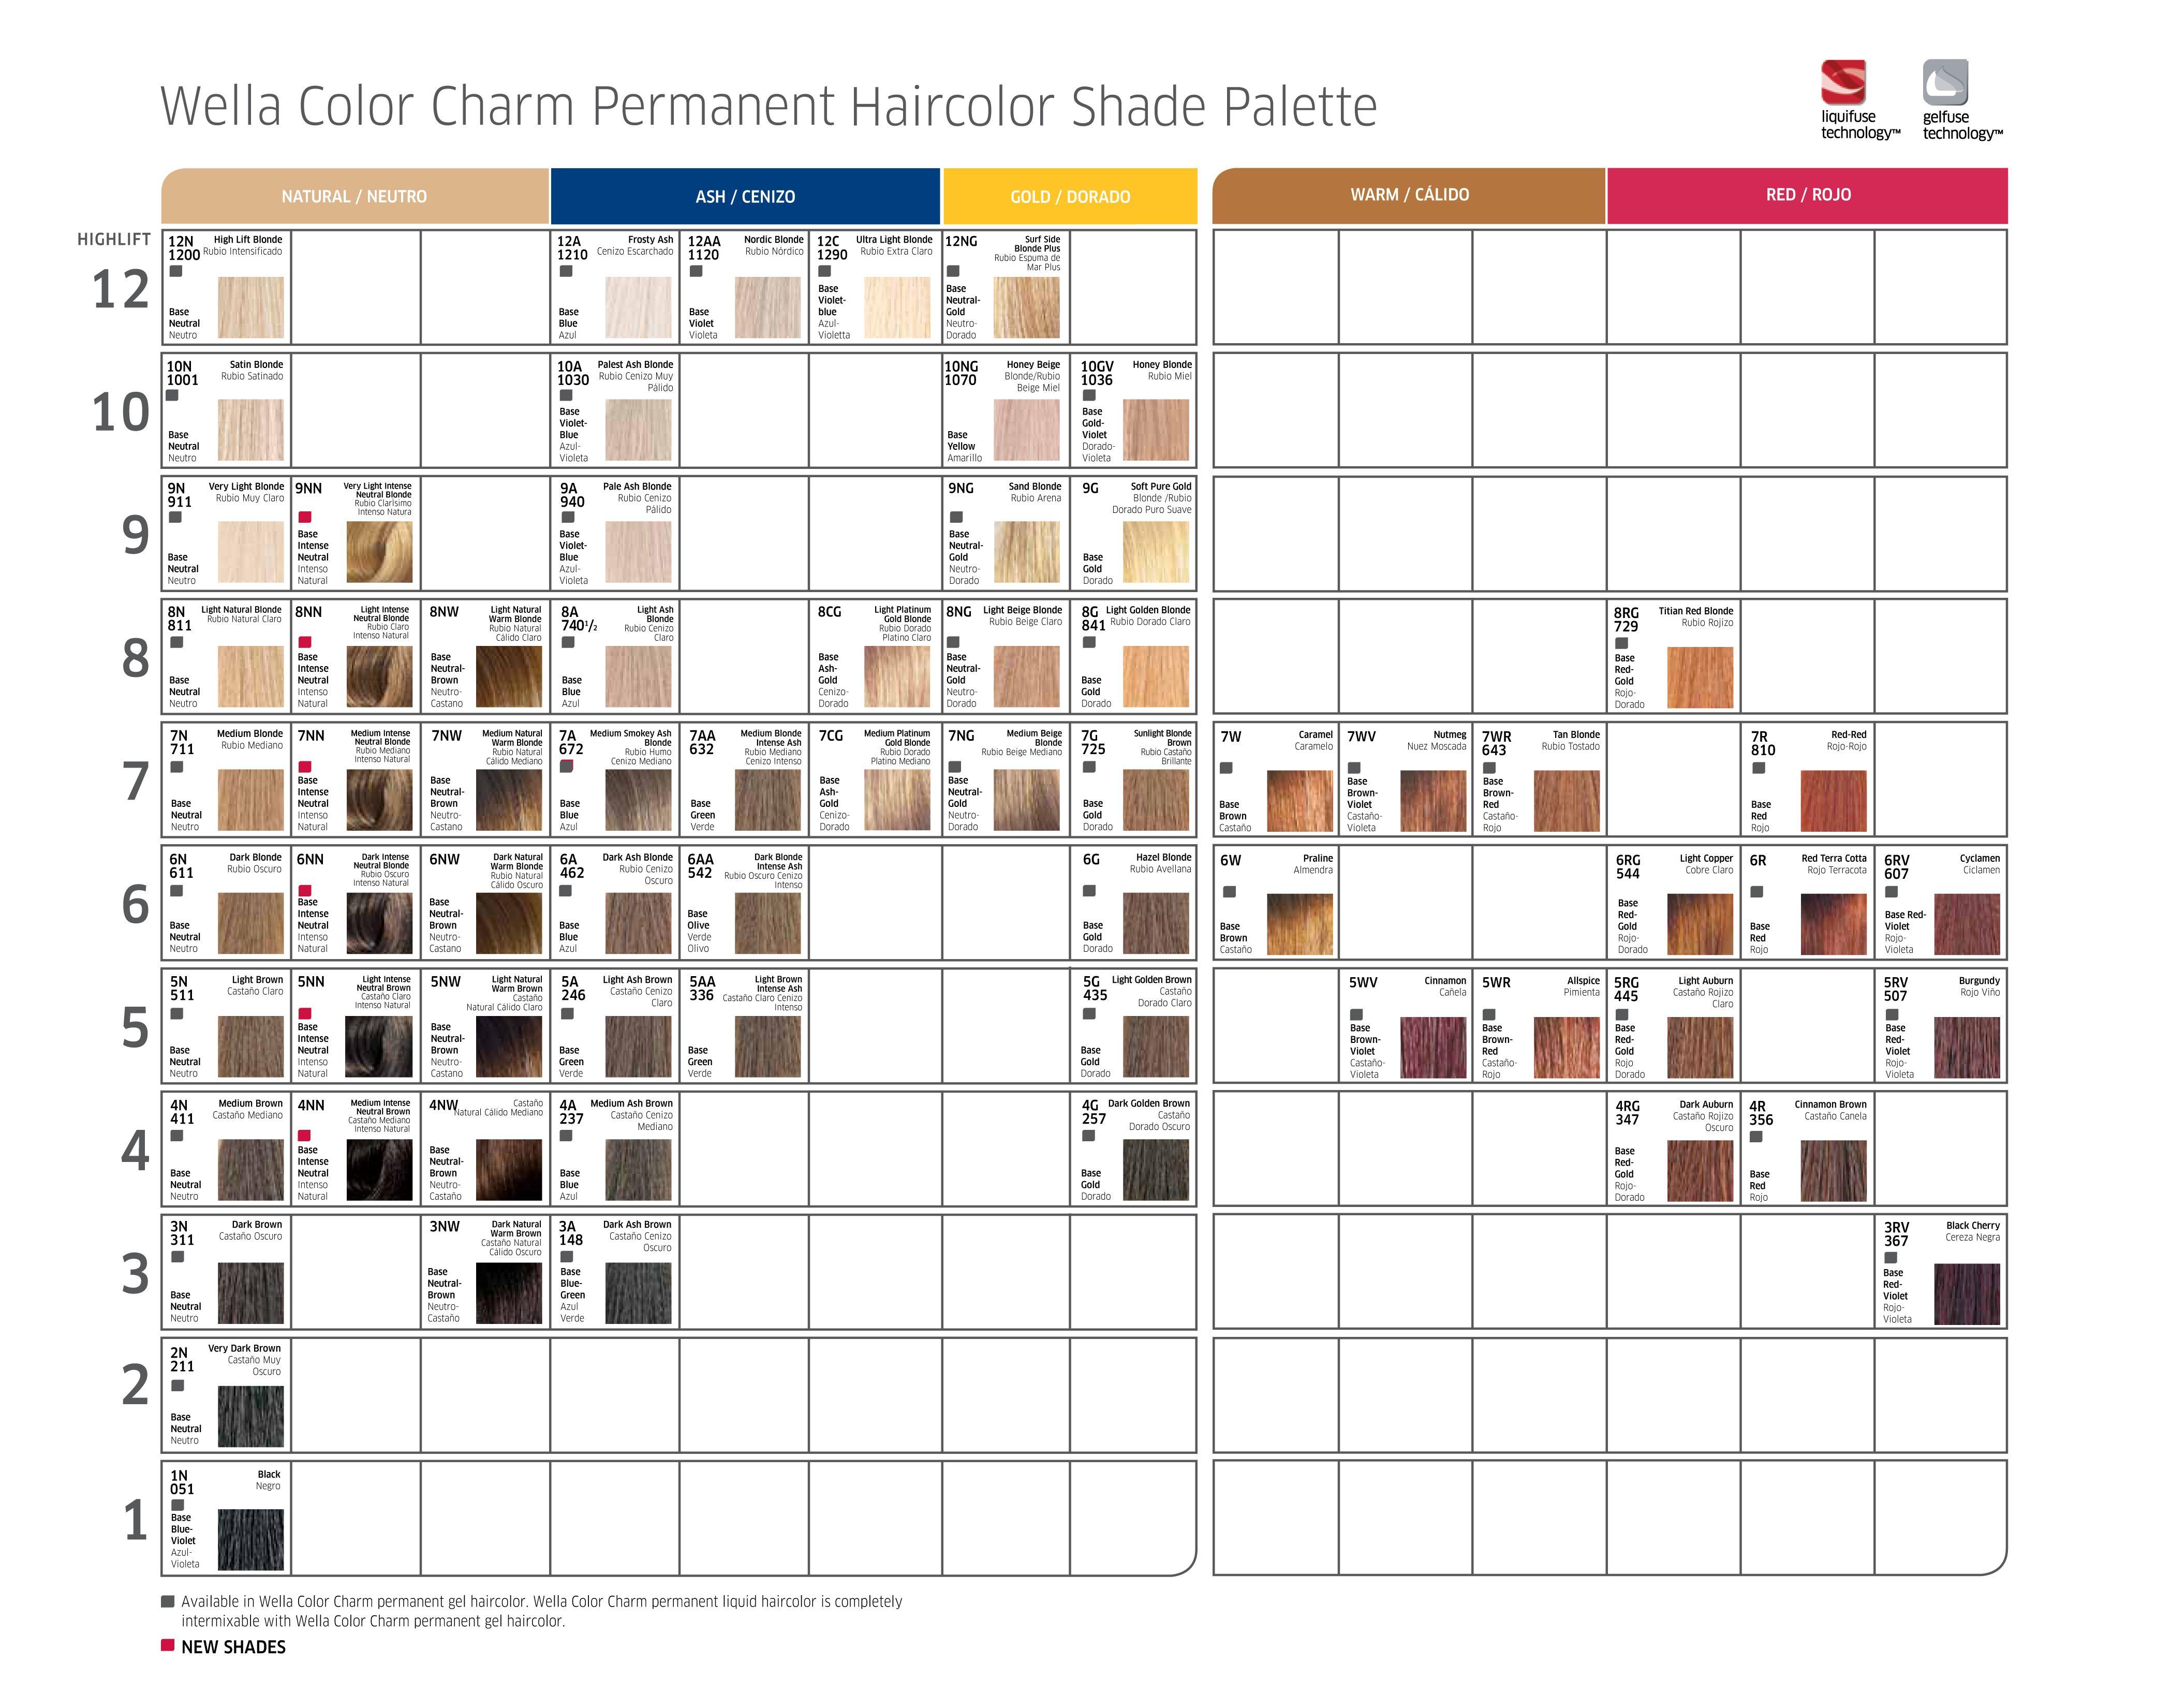 cac acf  bcc      wella color charm chart hair also tango shade rh pinterest